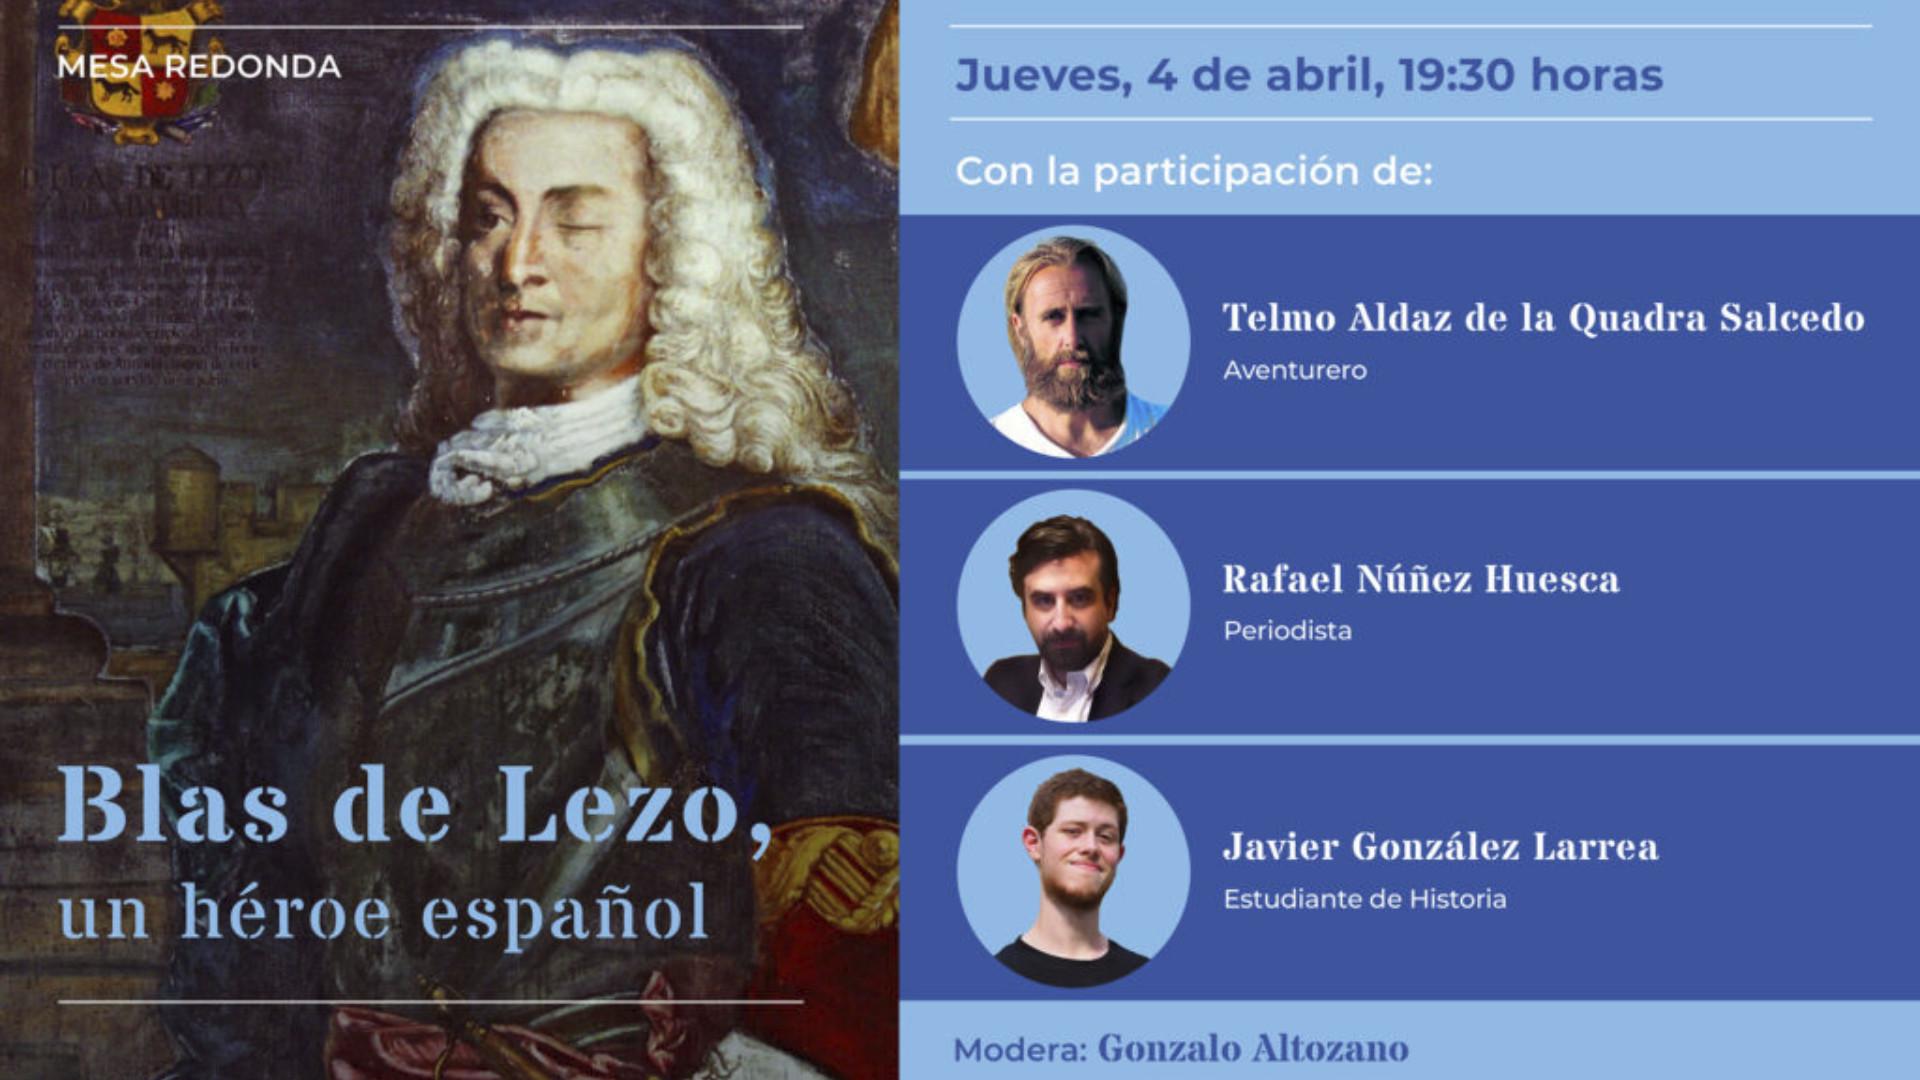 Mesa redonda 'Blas de Lezo, un héroe español'